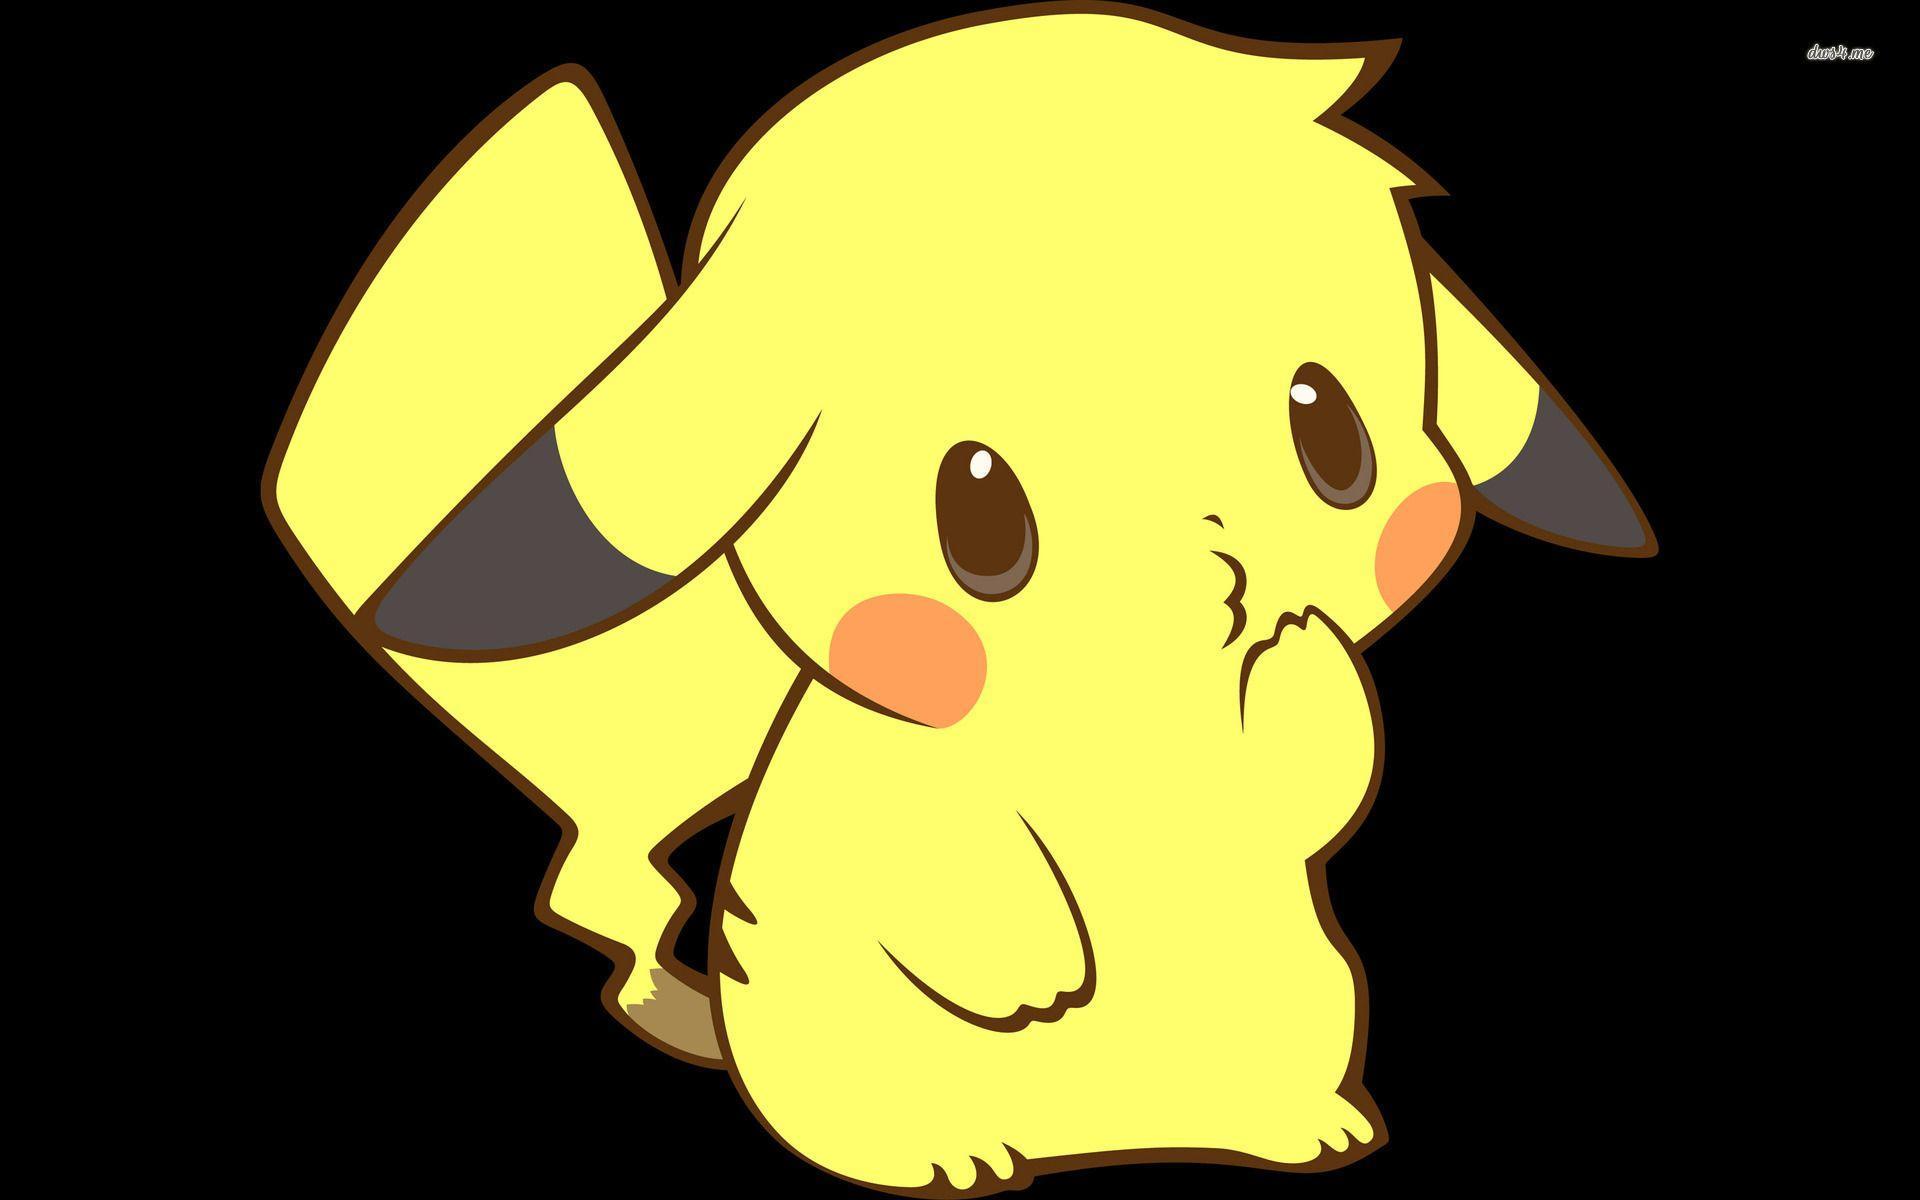 Cool Pikachu Wallpapers - Wallpaper Cave